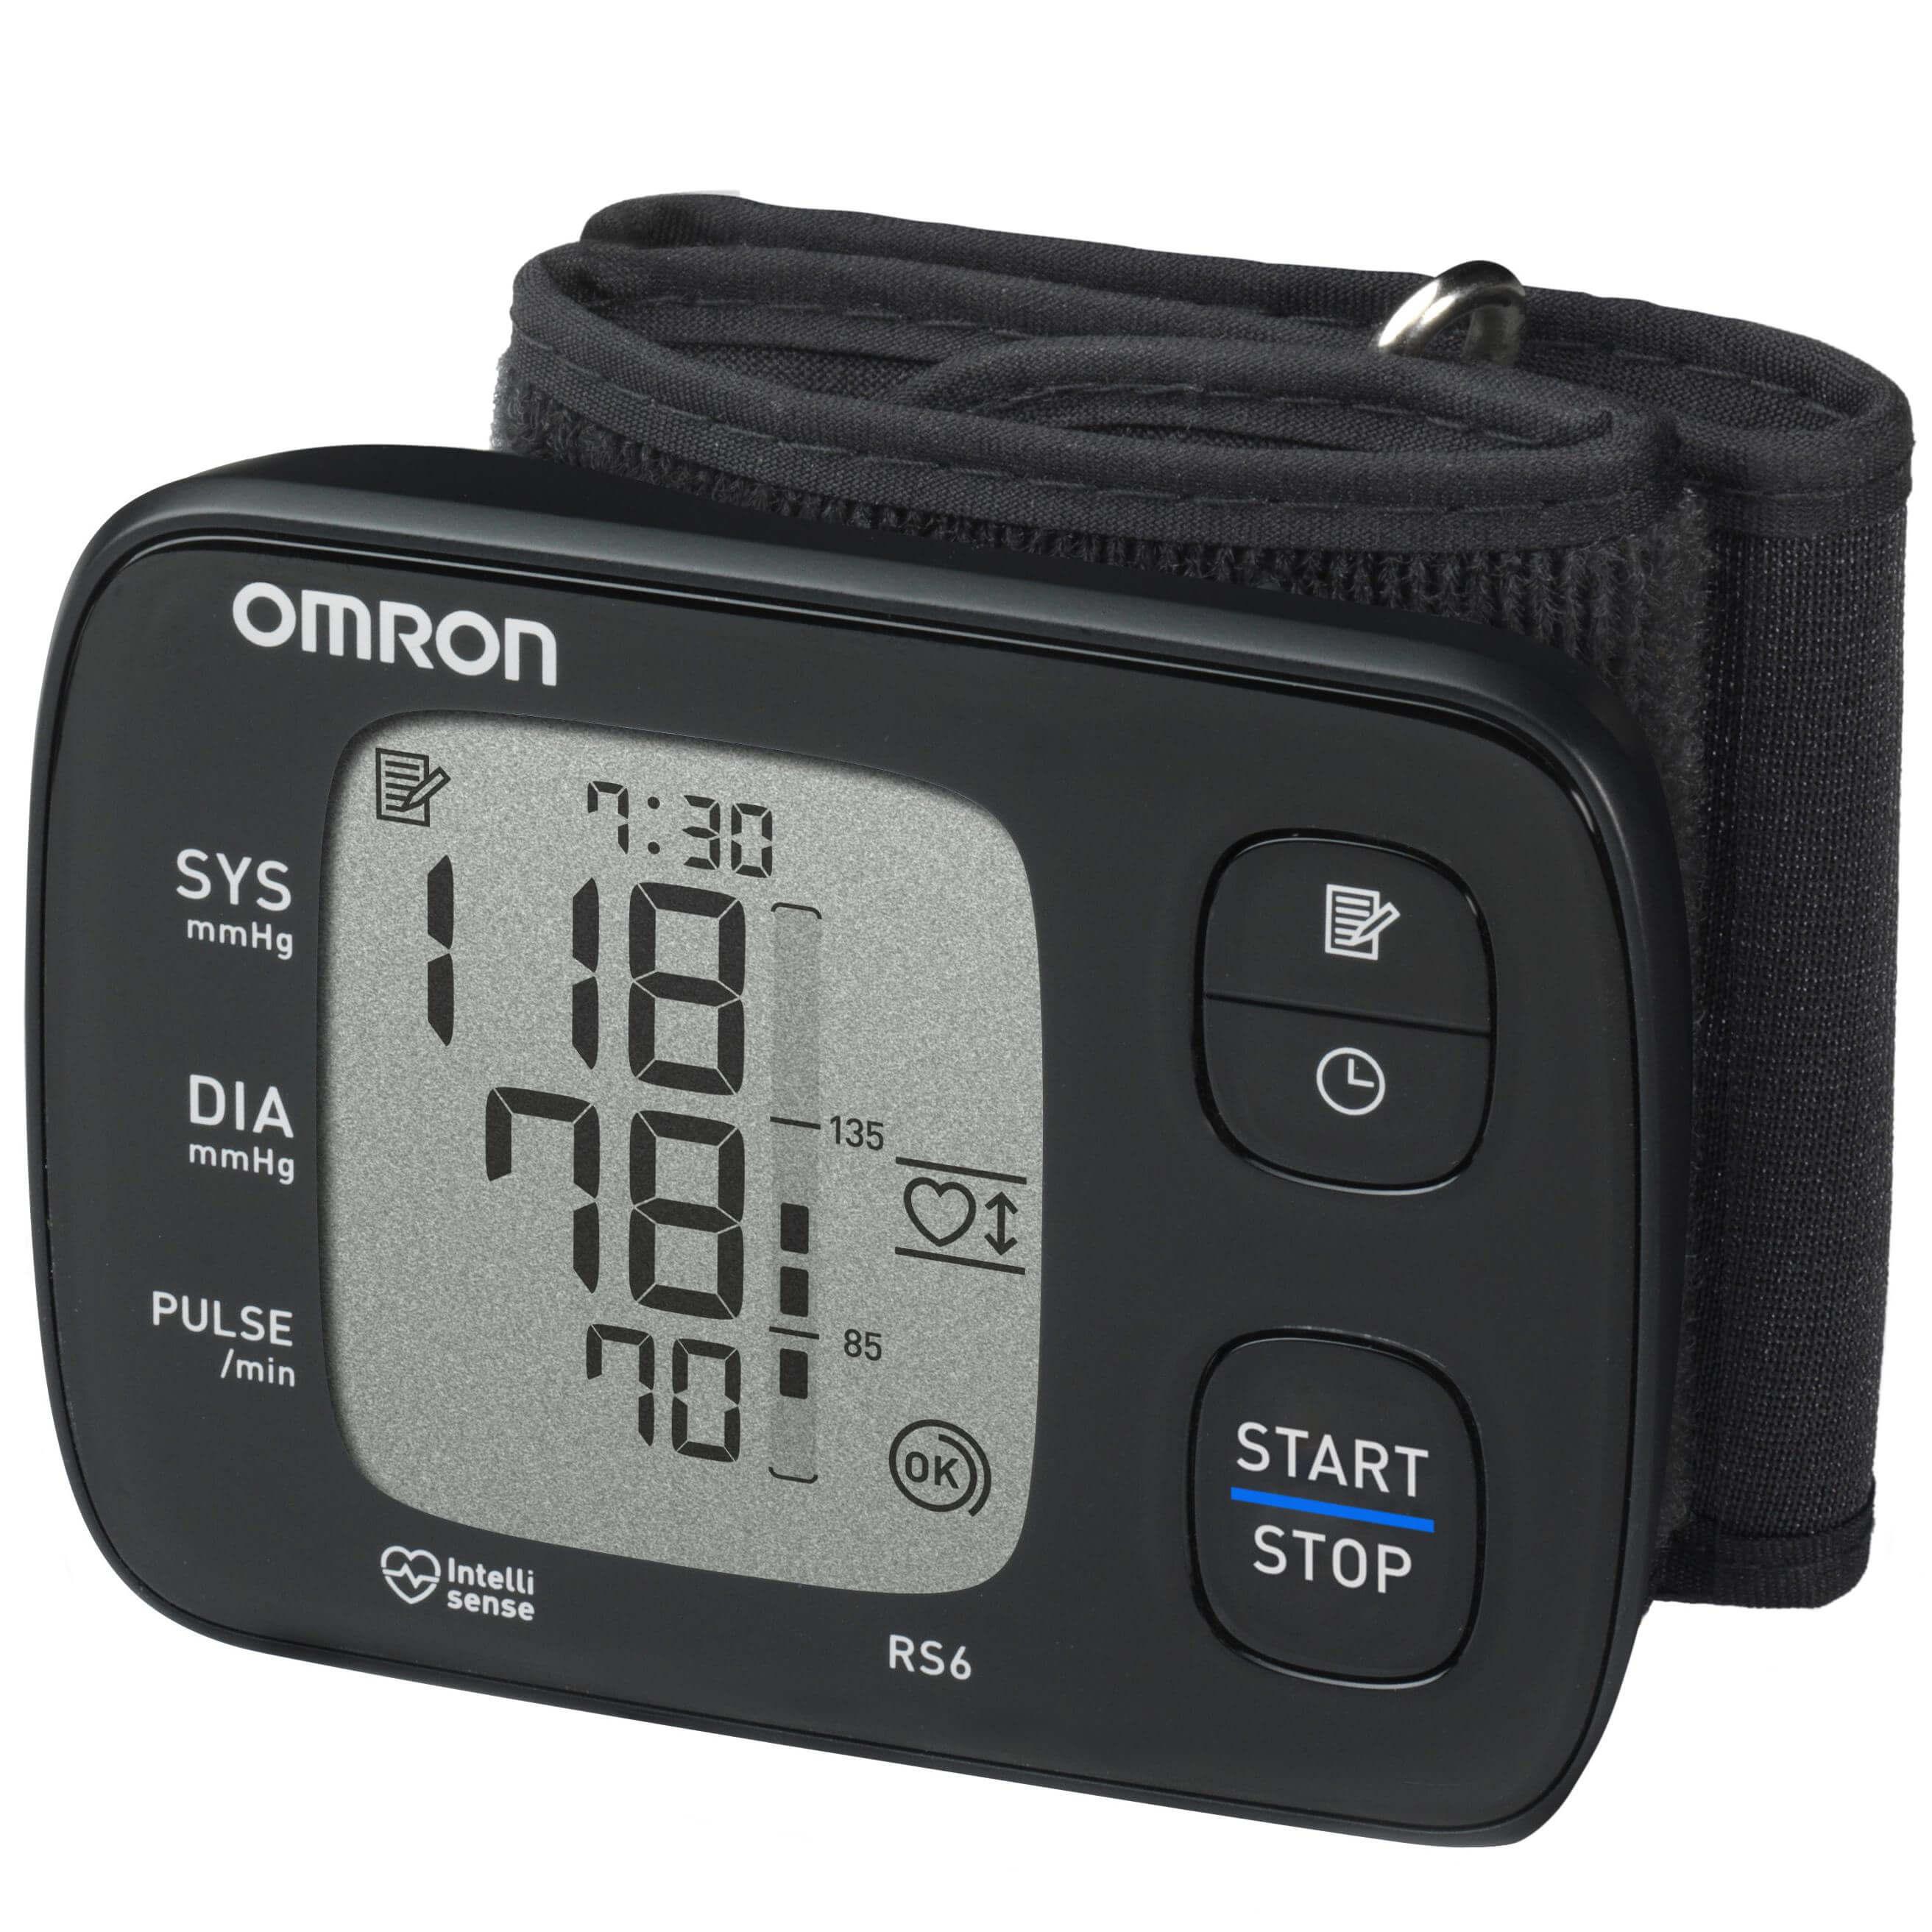 Omron RS6 Υπεραυτόματο Πιεσόμετρο Καρπού, 1 τεμάχιο φαρμακείο   πιεσόμετρα   θερμόμετρα   ηλεκτρικές συσκευές   πιεσόμετρα